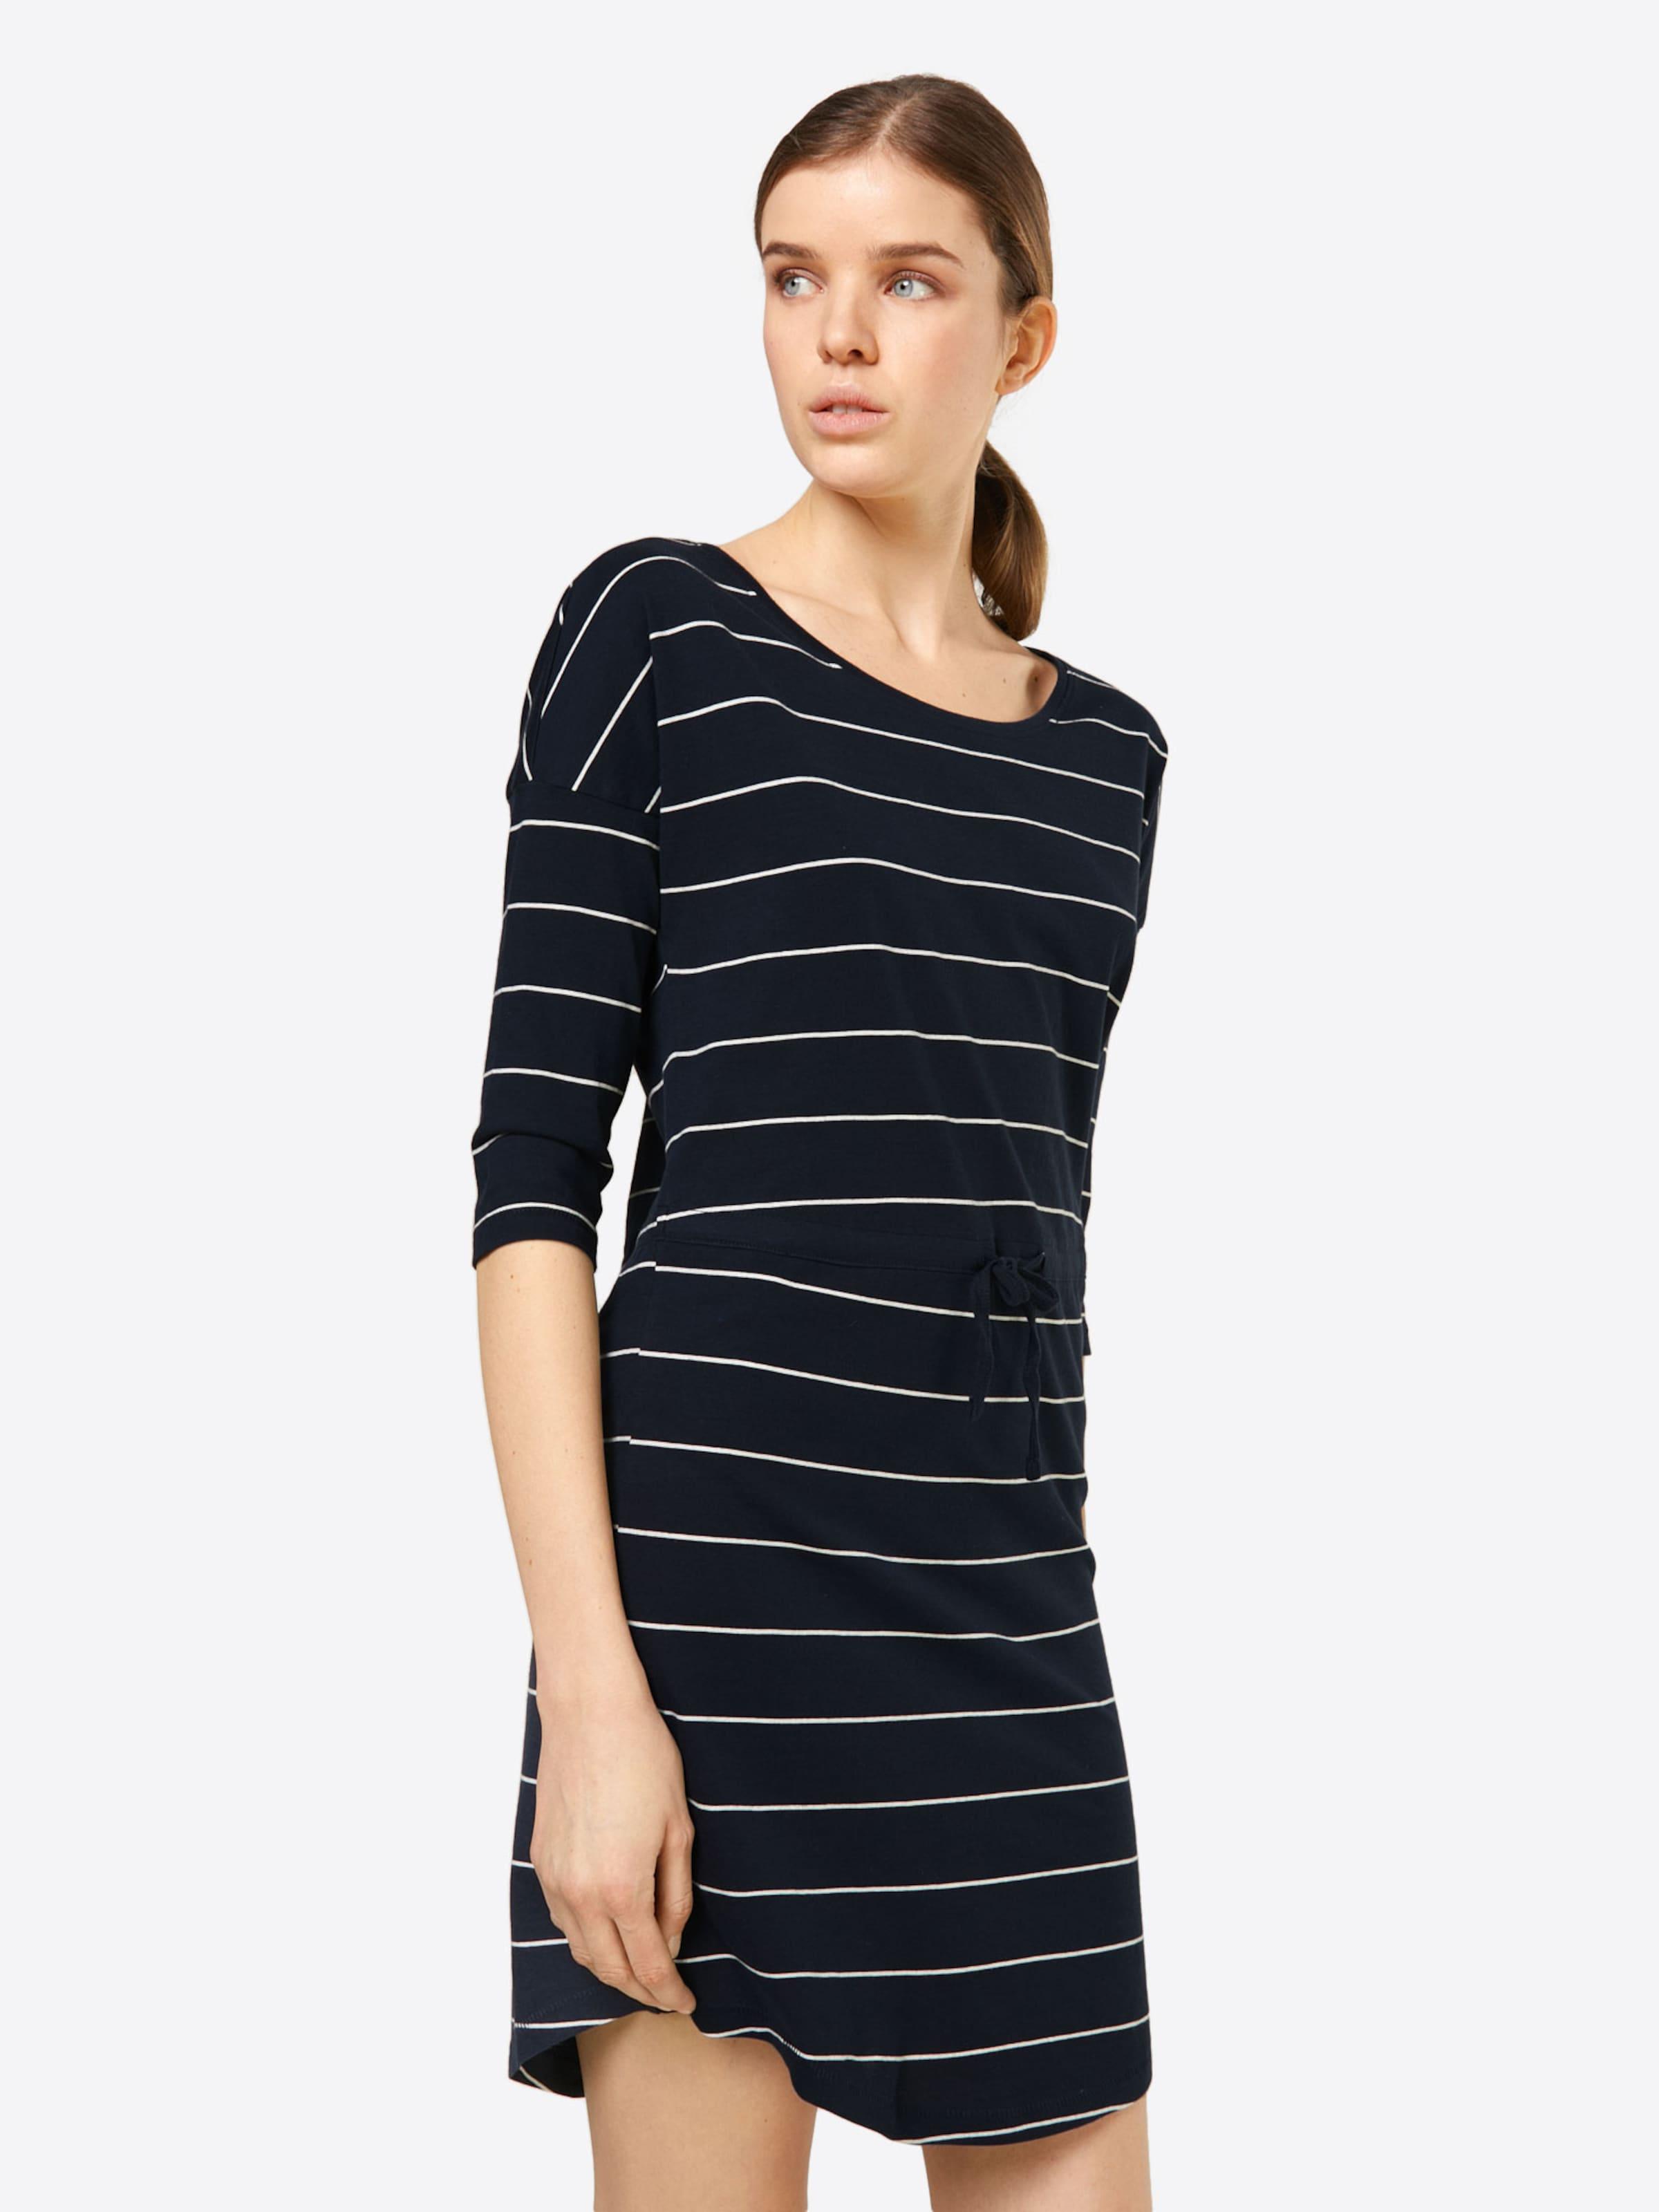 ONLY Jerseykleid Billig Vermarktbare 1tClCT